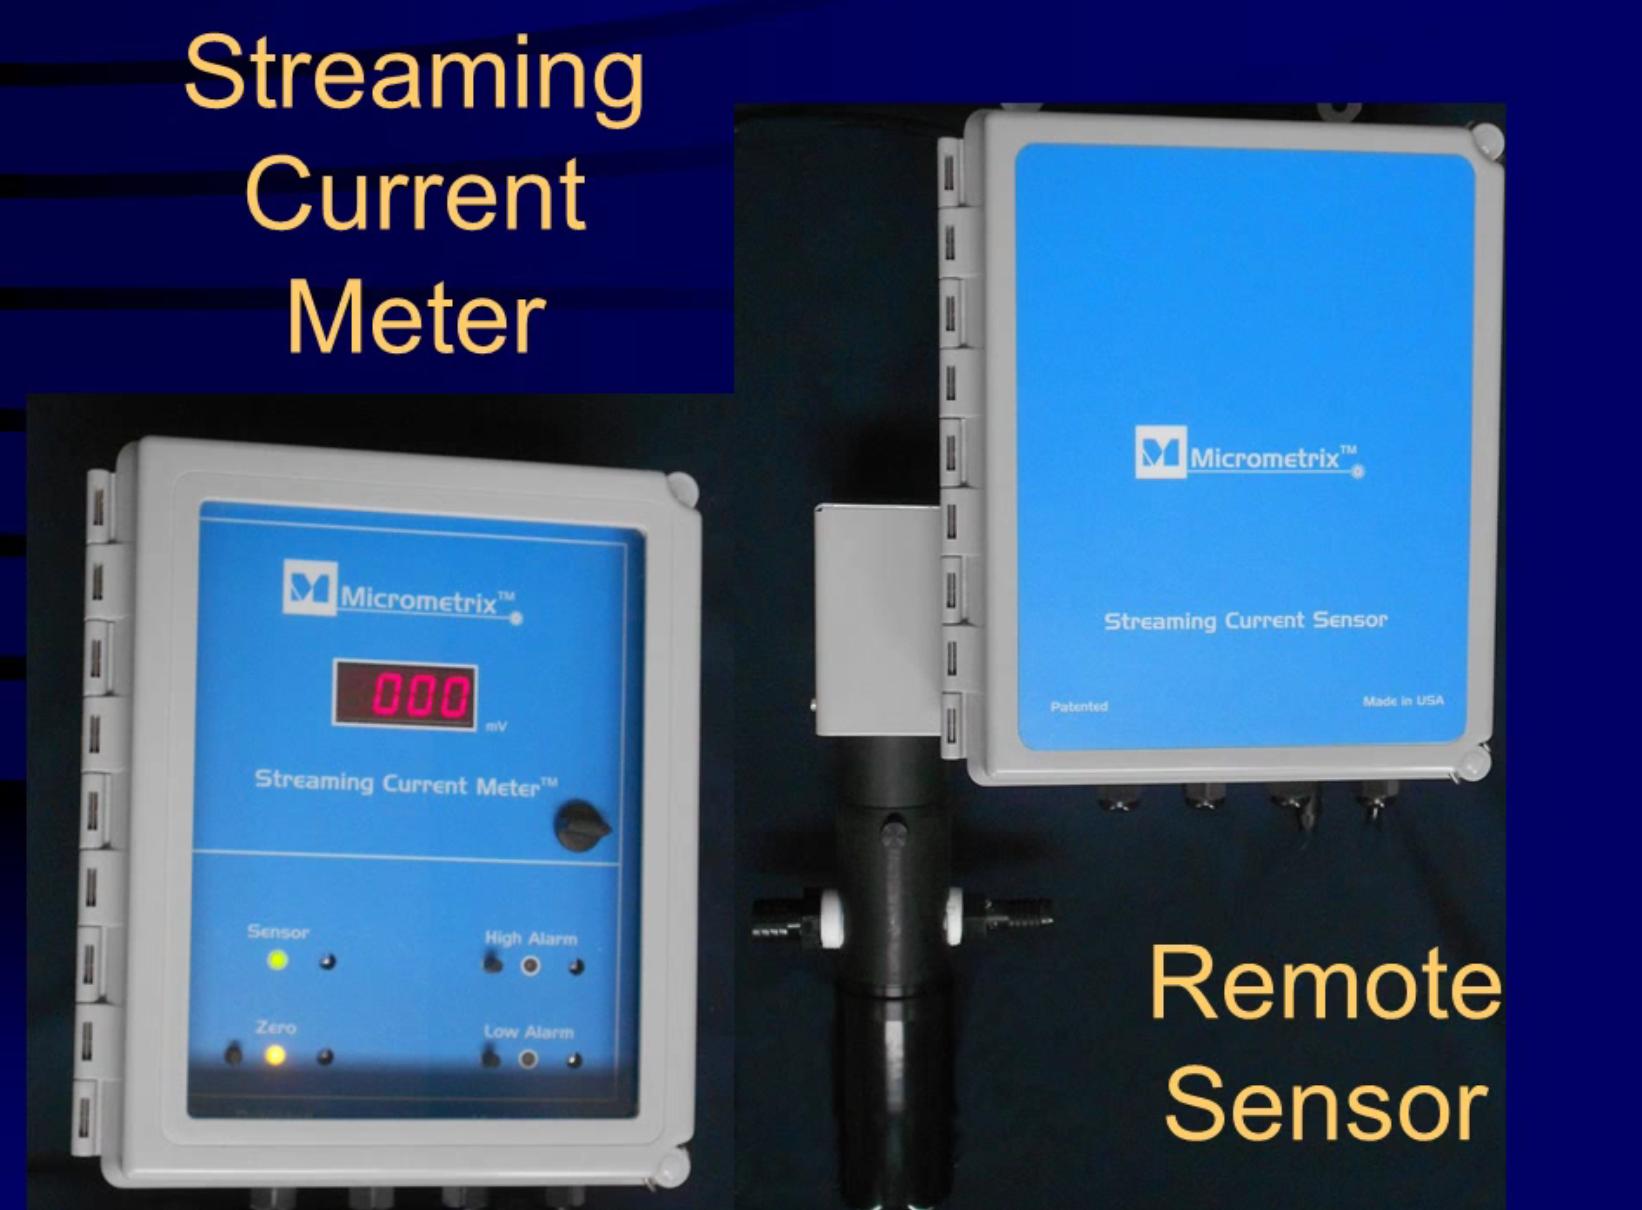 Micrometrix Streaming Current Monitor